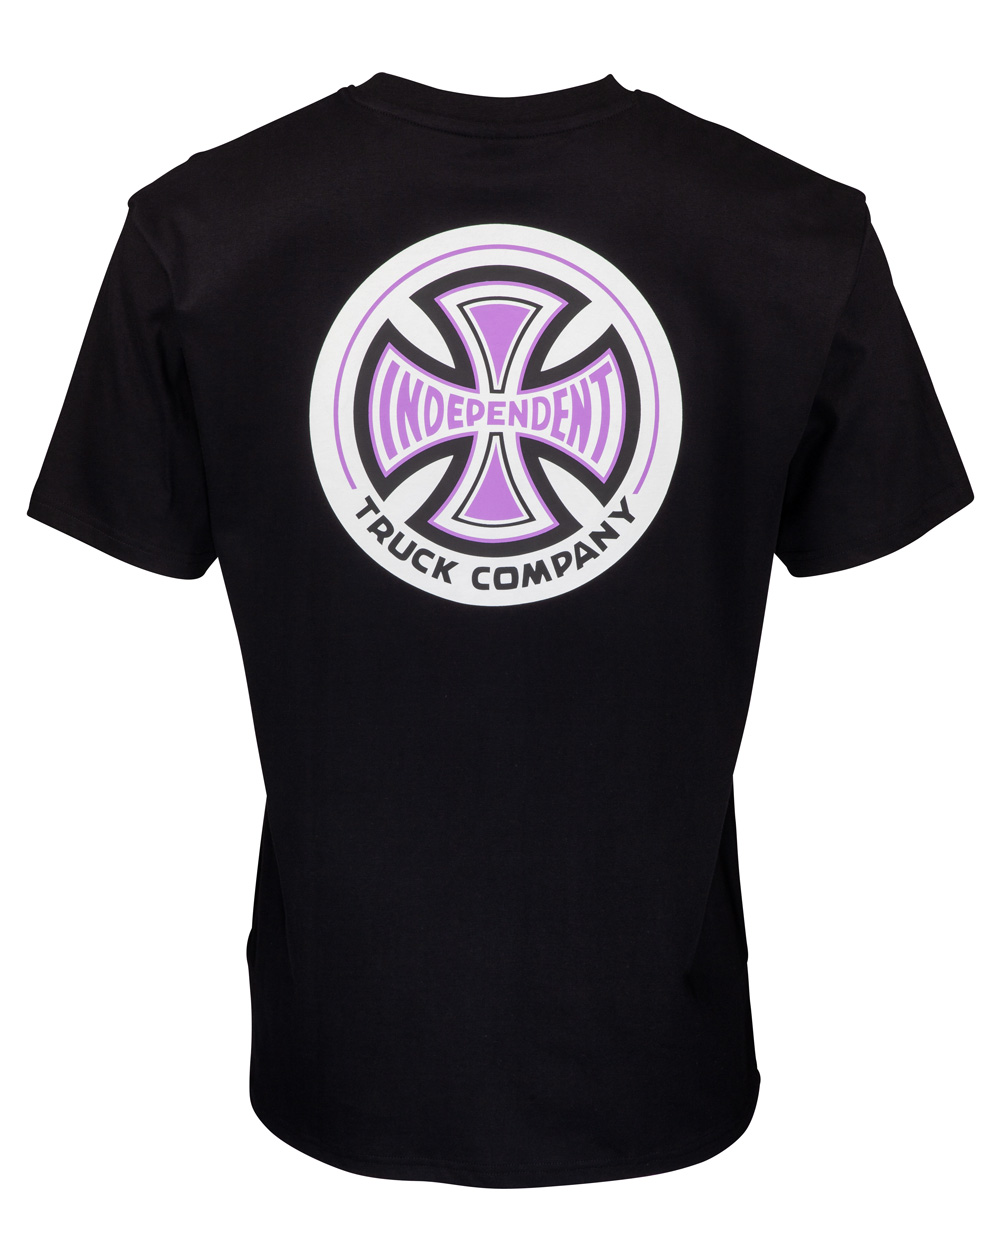 Independent Men's T-Shirt 78 Cross Black